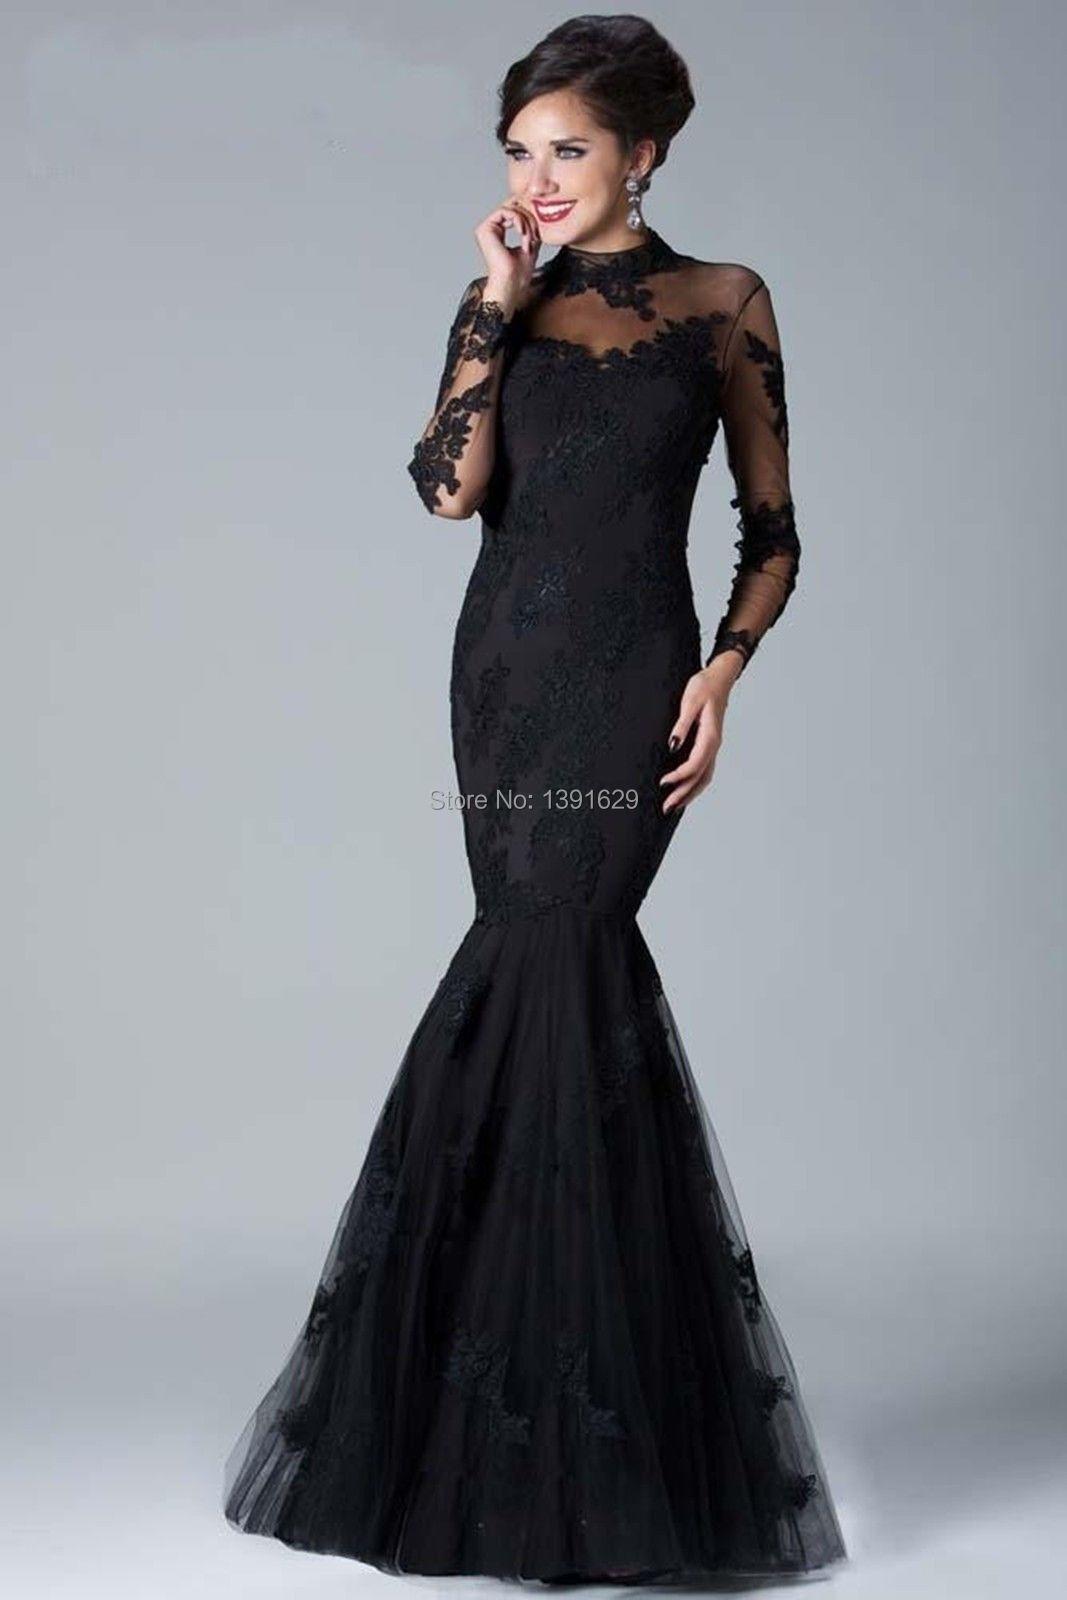 Atlantis Long Sleeve Black Applique Mermaid Women Formal Party ...